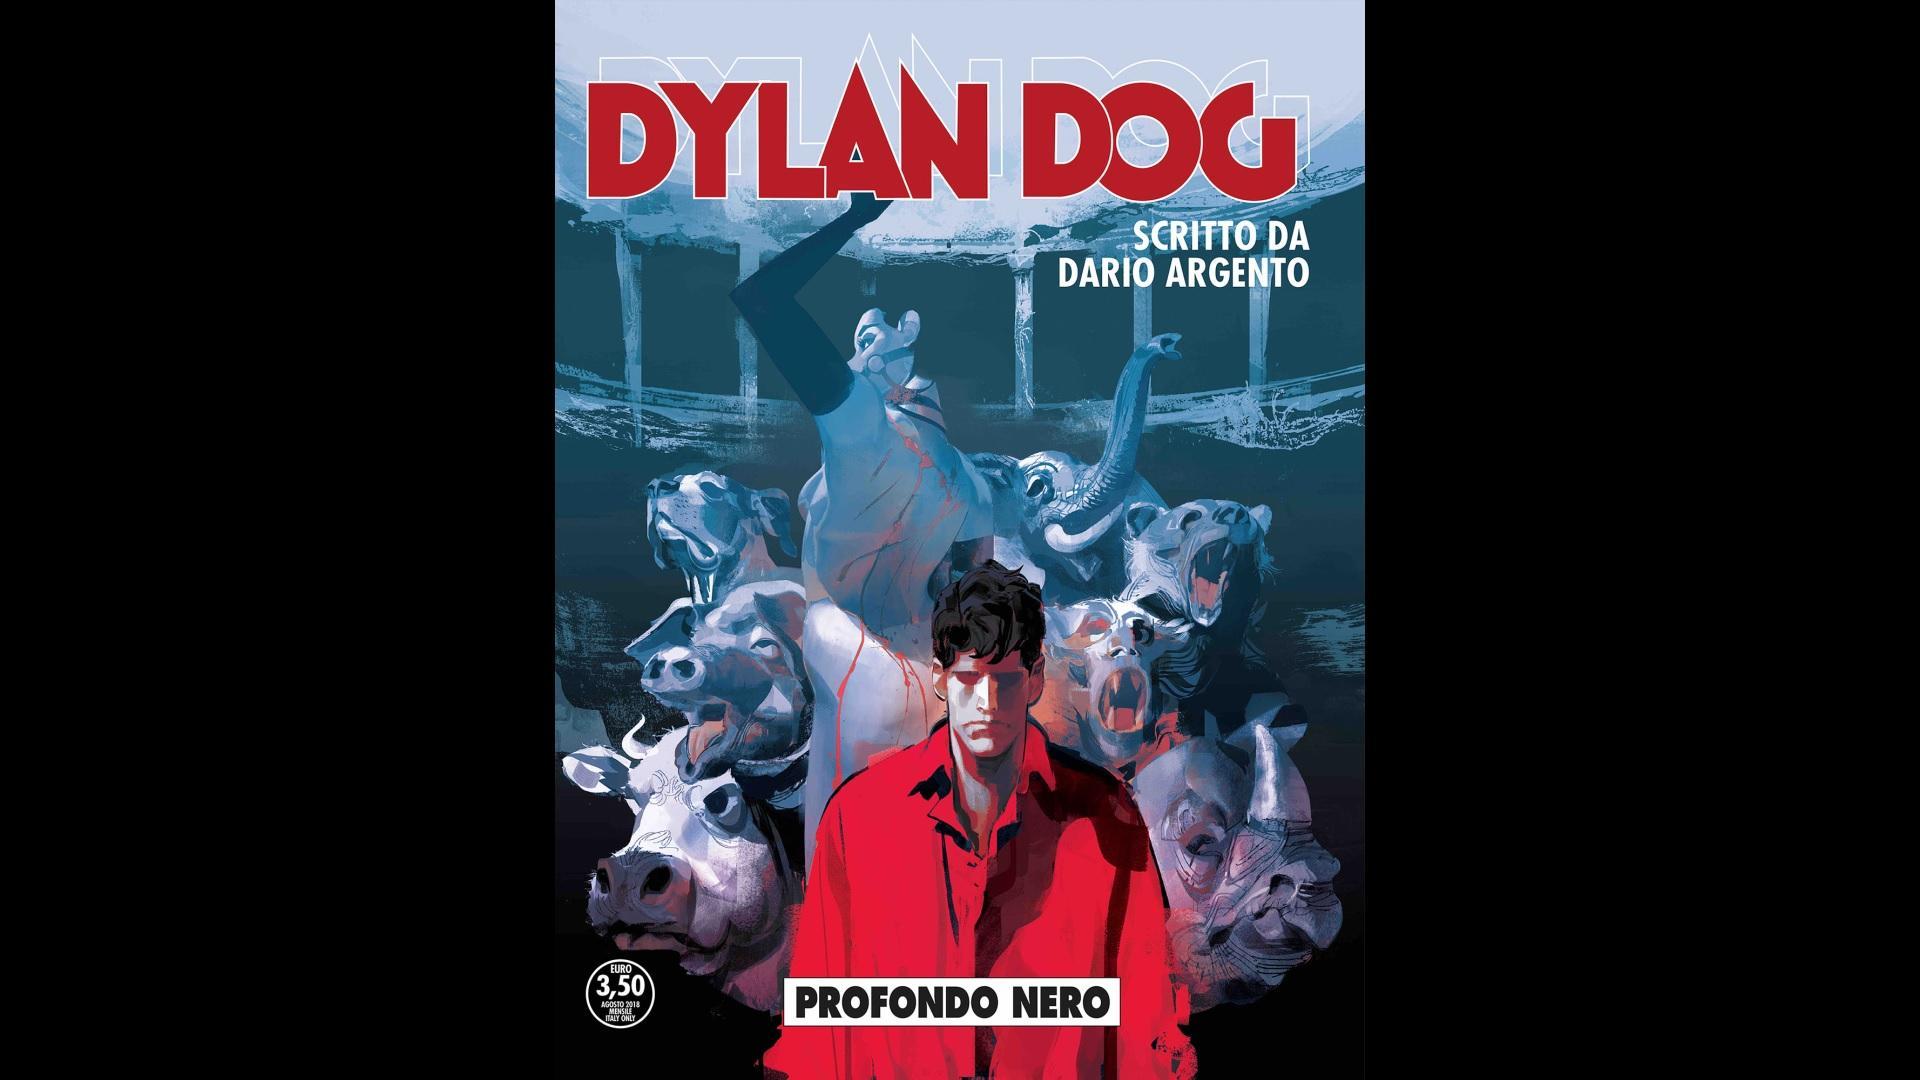 Profondo nero, l incontro tra Dario Argento e Dylan Dog